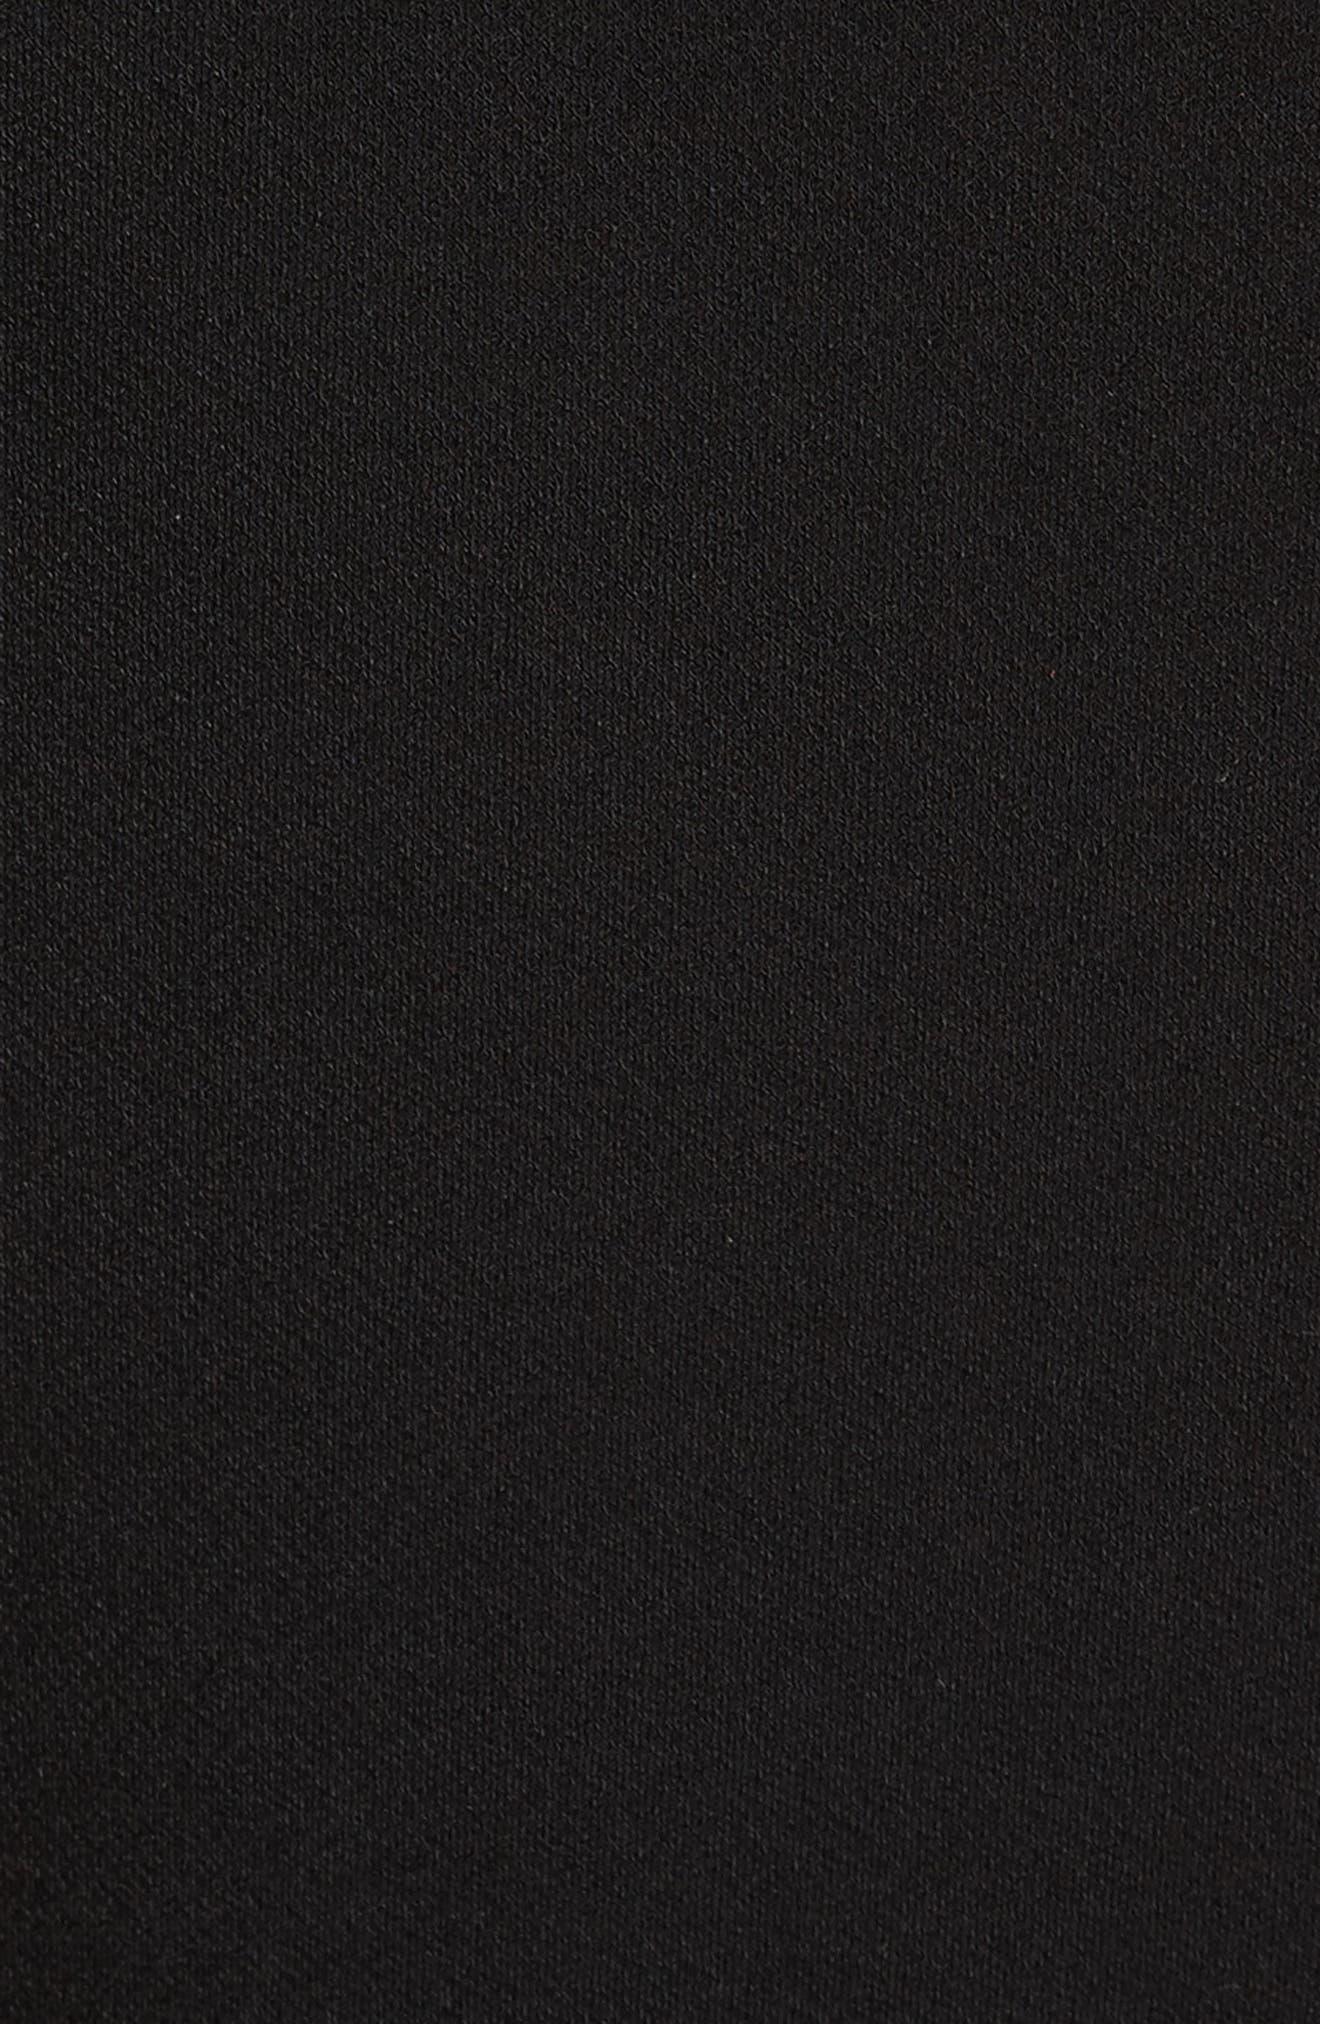 Malia Cutout One-Shoulder Maxi Dress,                             Alternate thumbnail 5, color,                             001